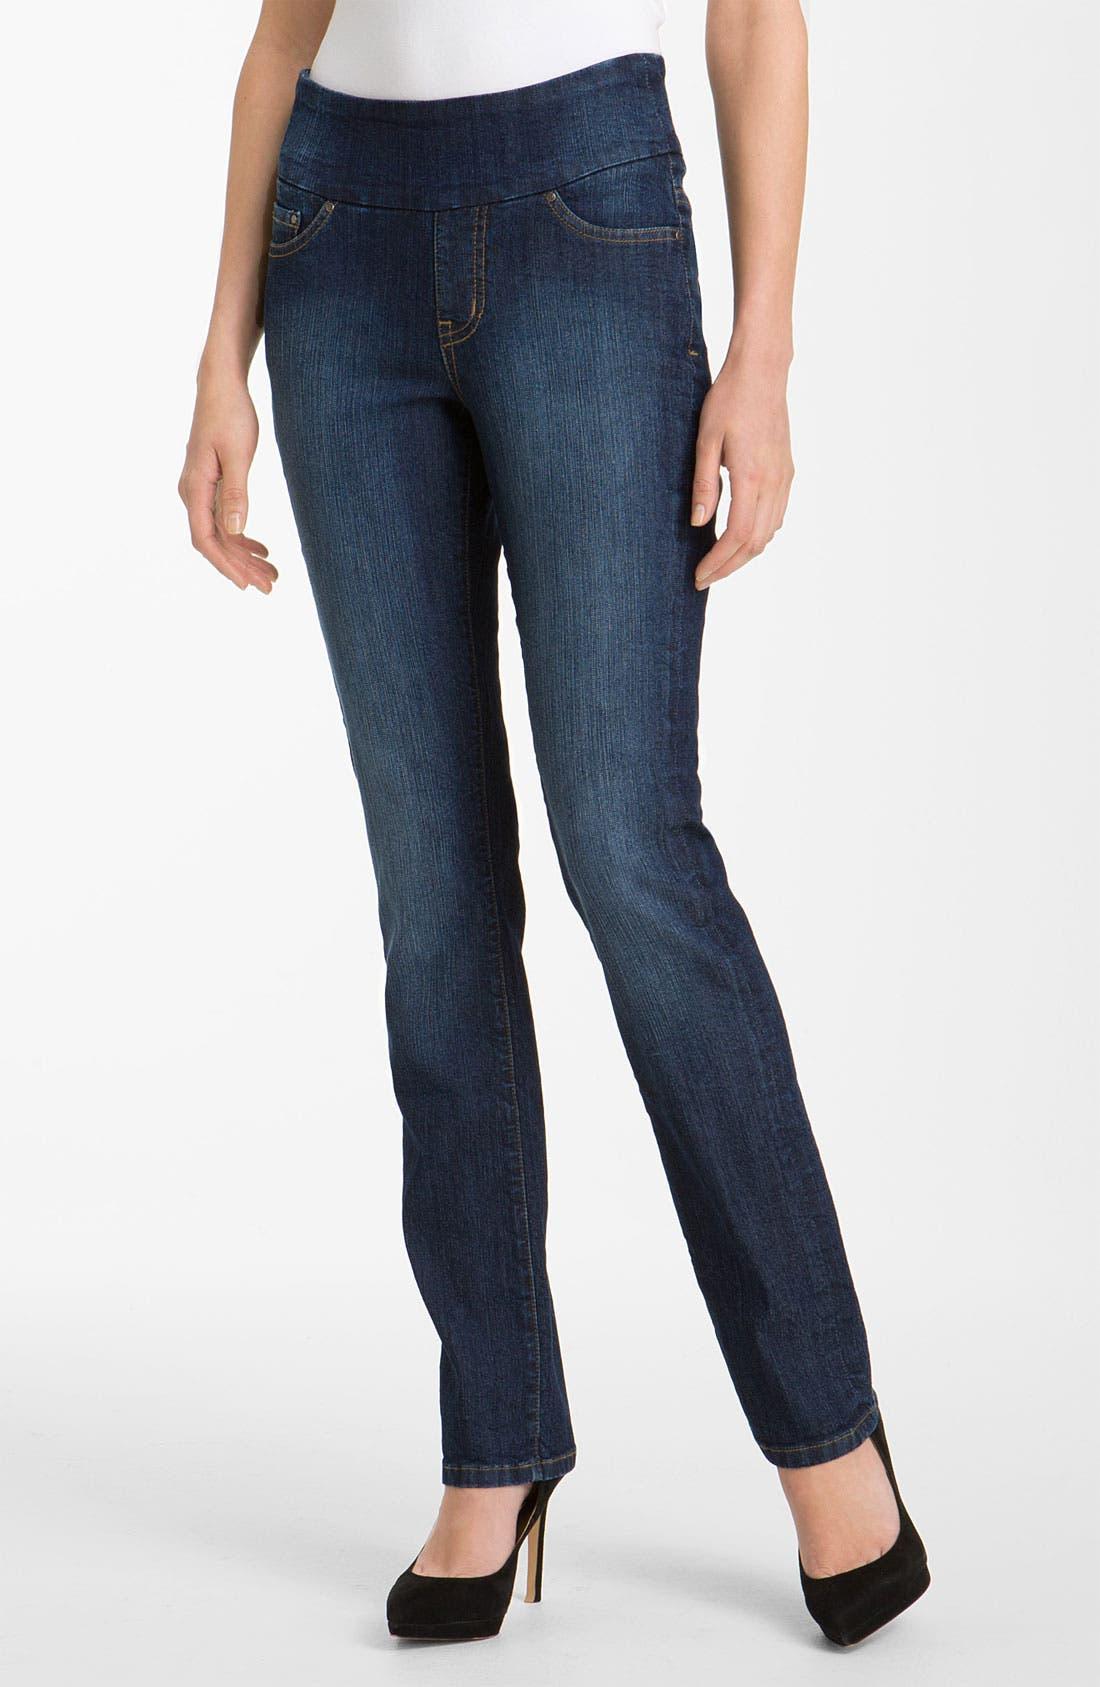 Main Image - Jag Jeans 'Peri' Pull-On Jeans (Petite)